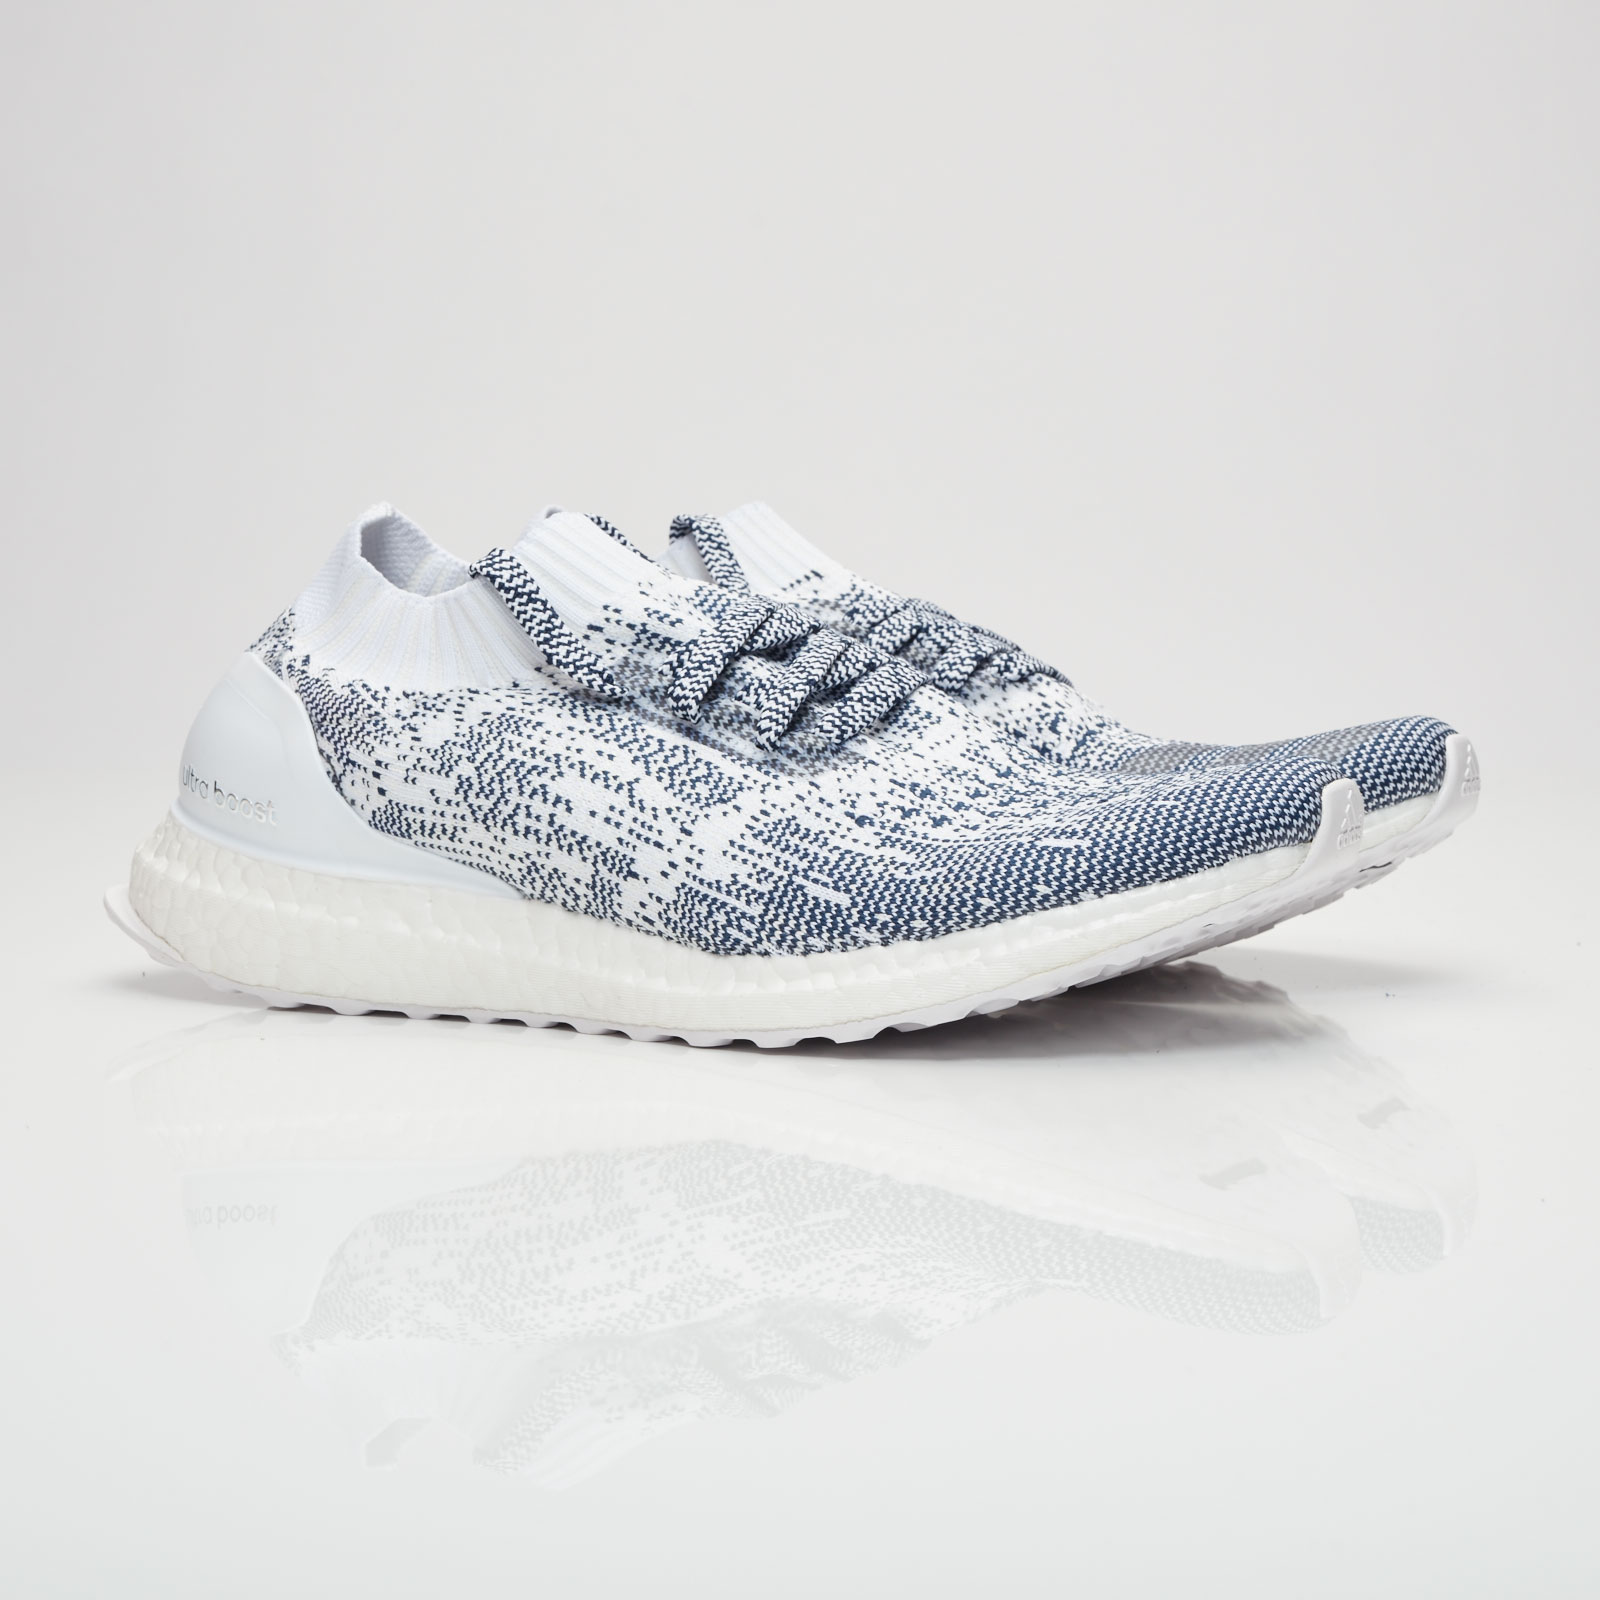 7a036e5b1 adidas Ultra Boost Uncaged - Ba9616 - Sneakersnstuff